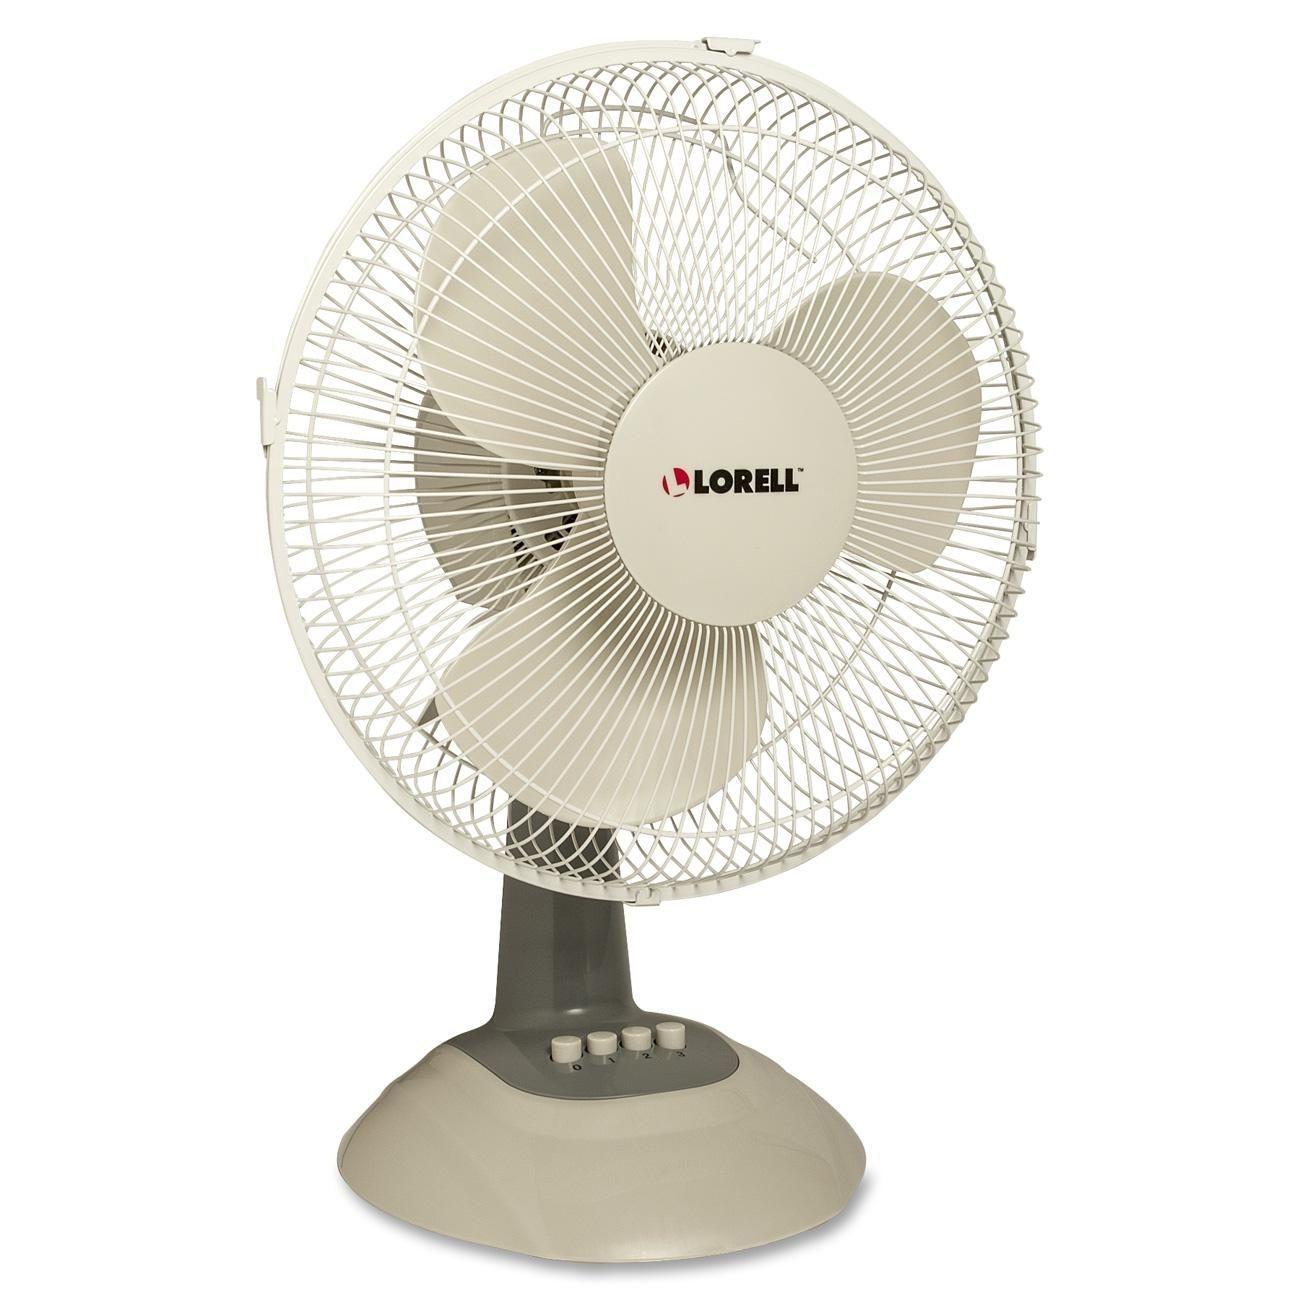 Small Oscillating Fans : Small oscillating desk fan vintage windmere quot